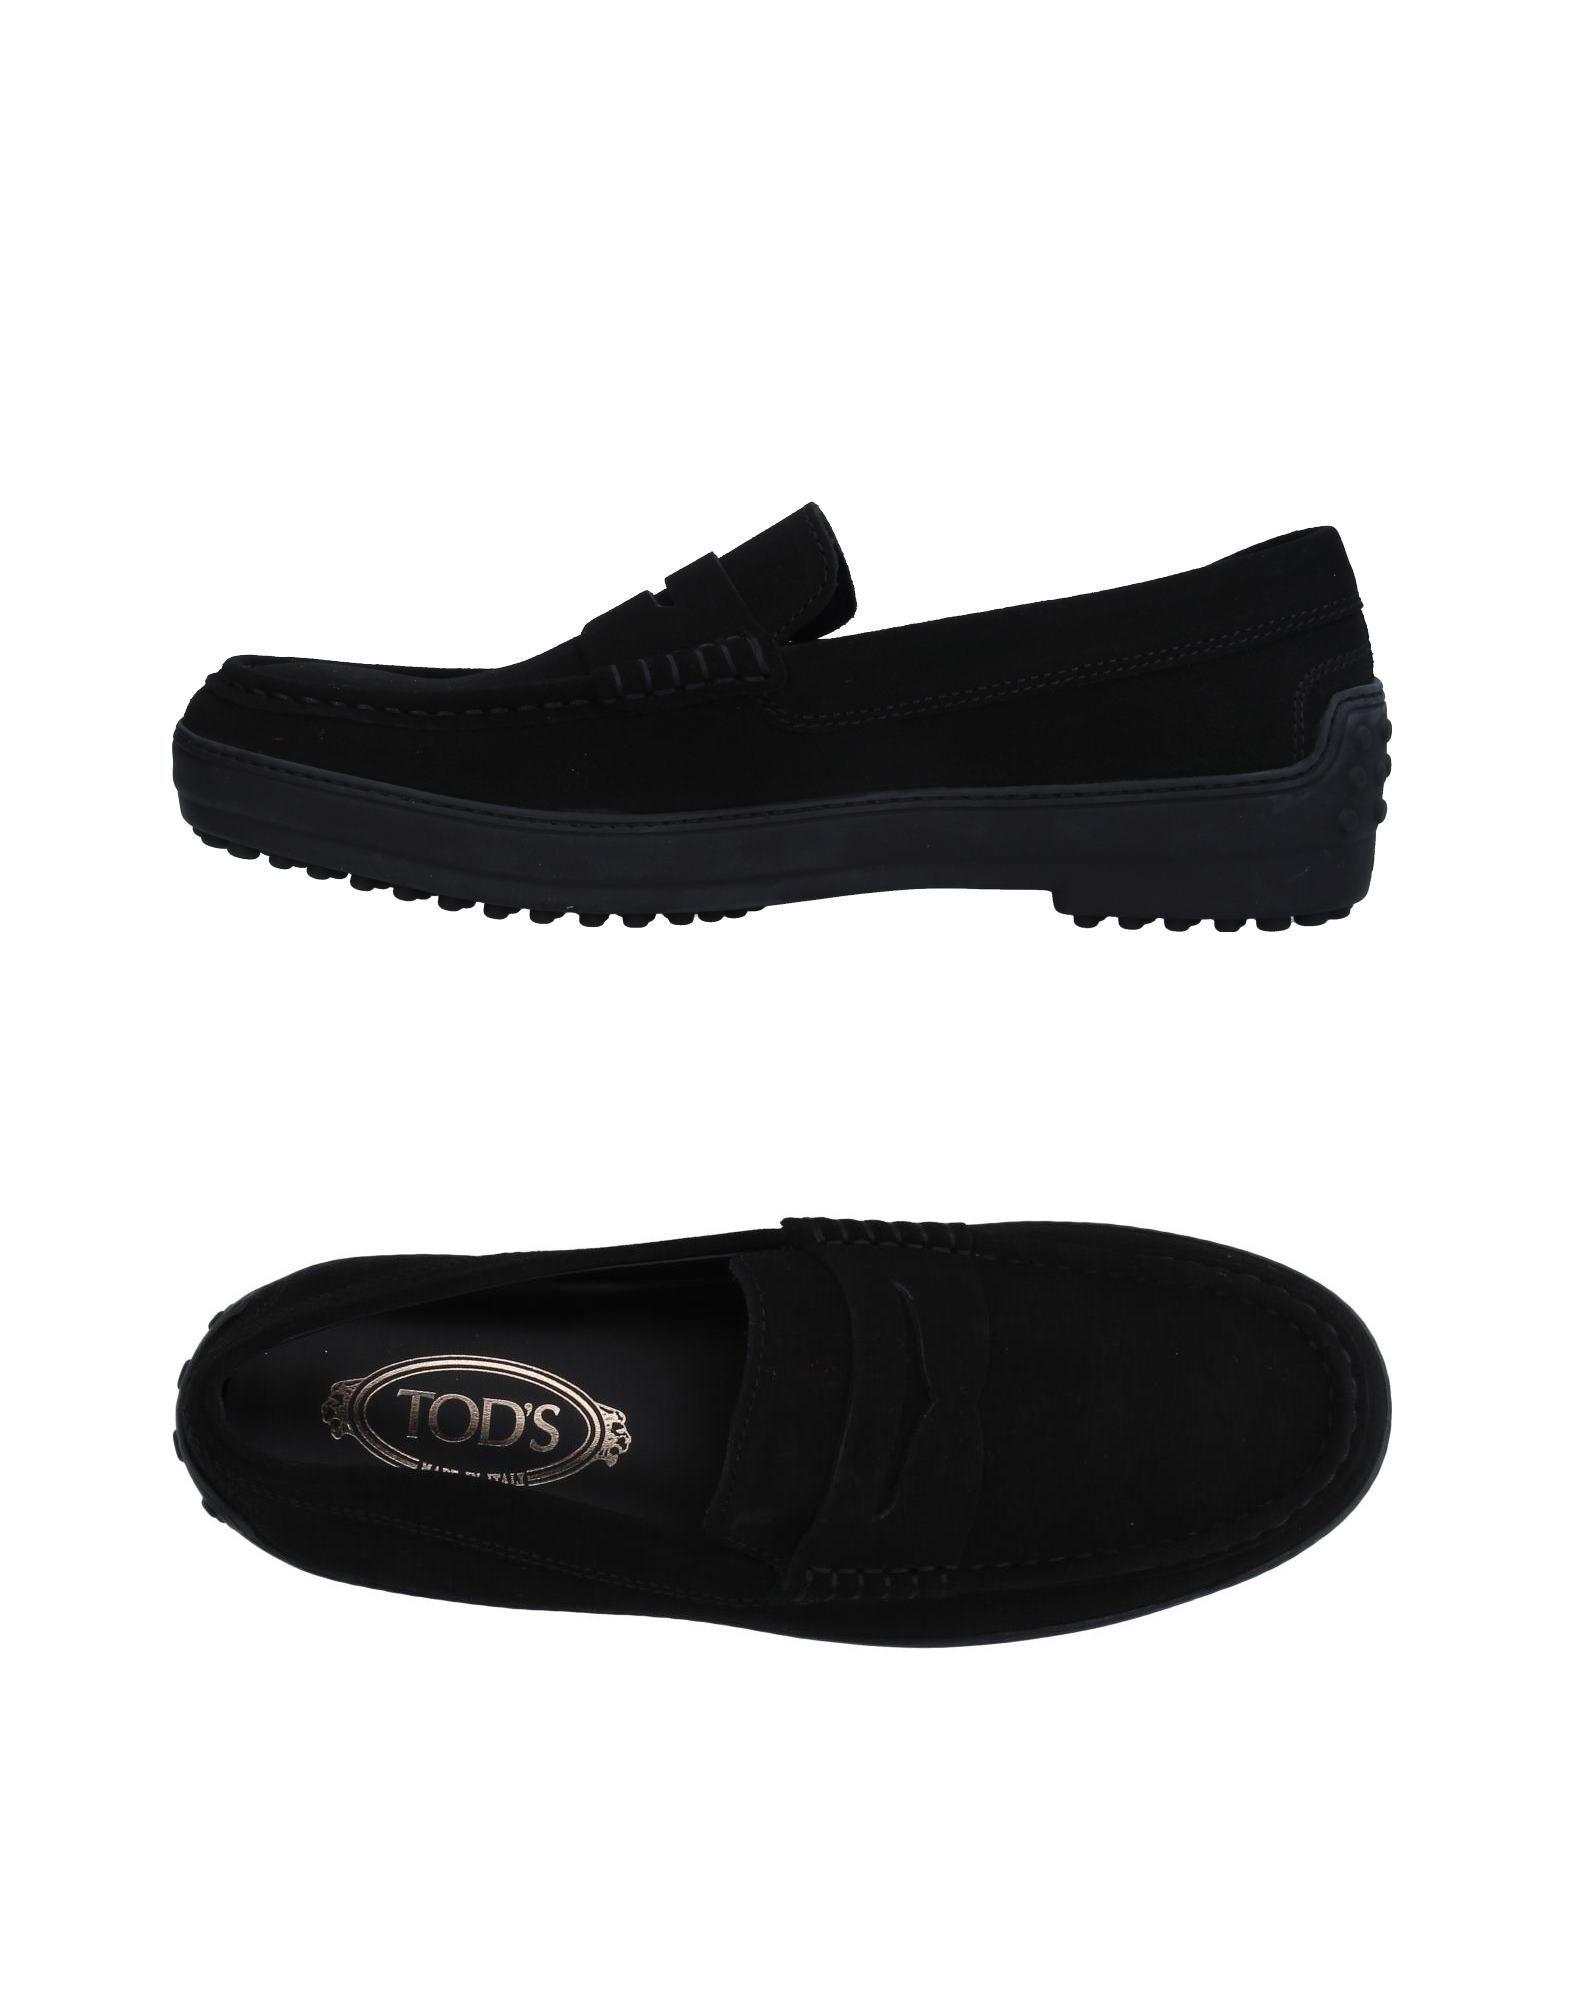 Tod's Mokassins Herren  11299241HH Gute Qualität beliebte Schuhe